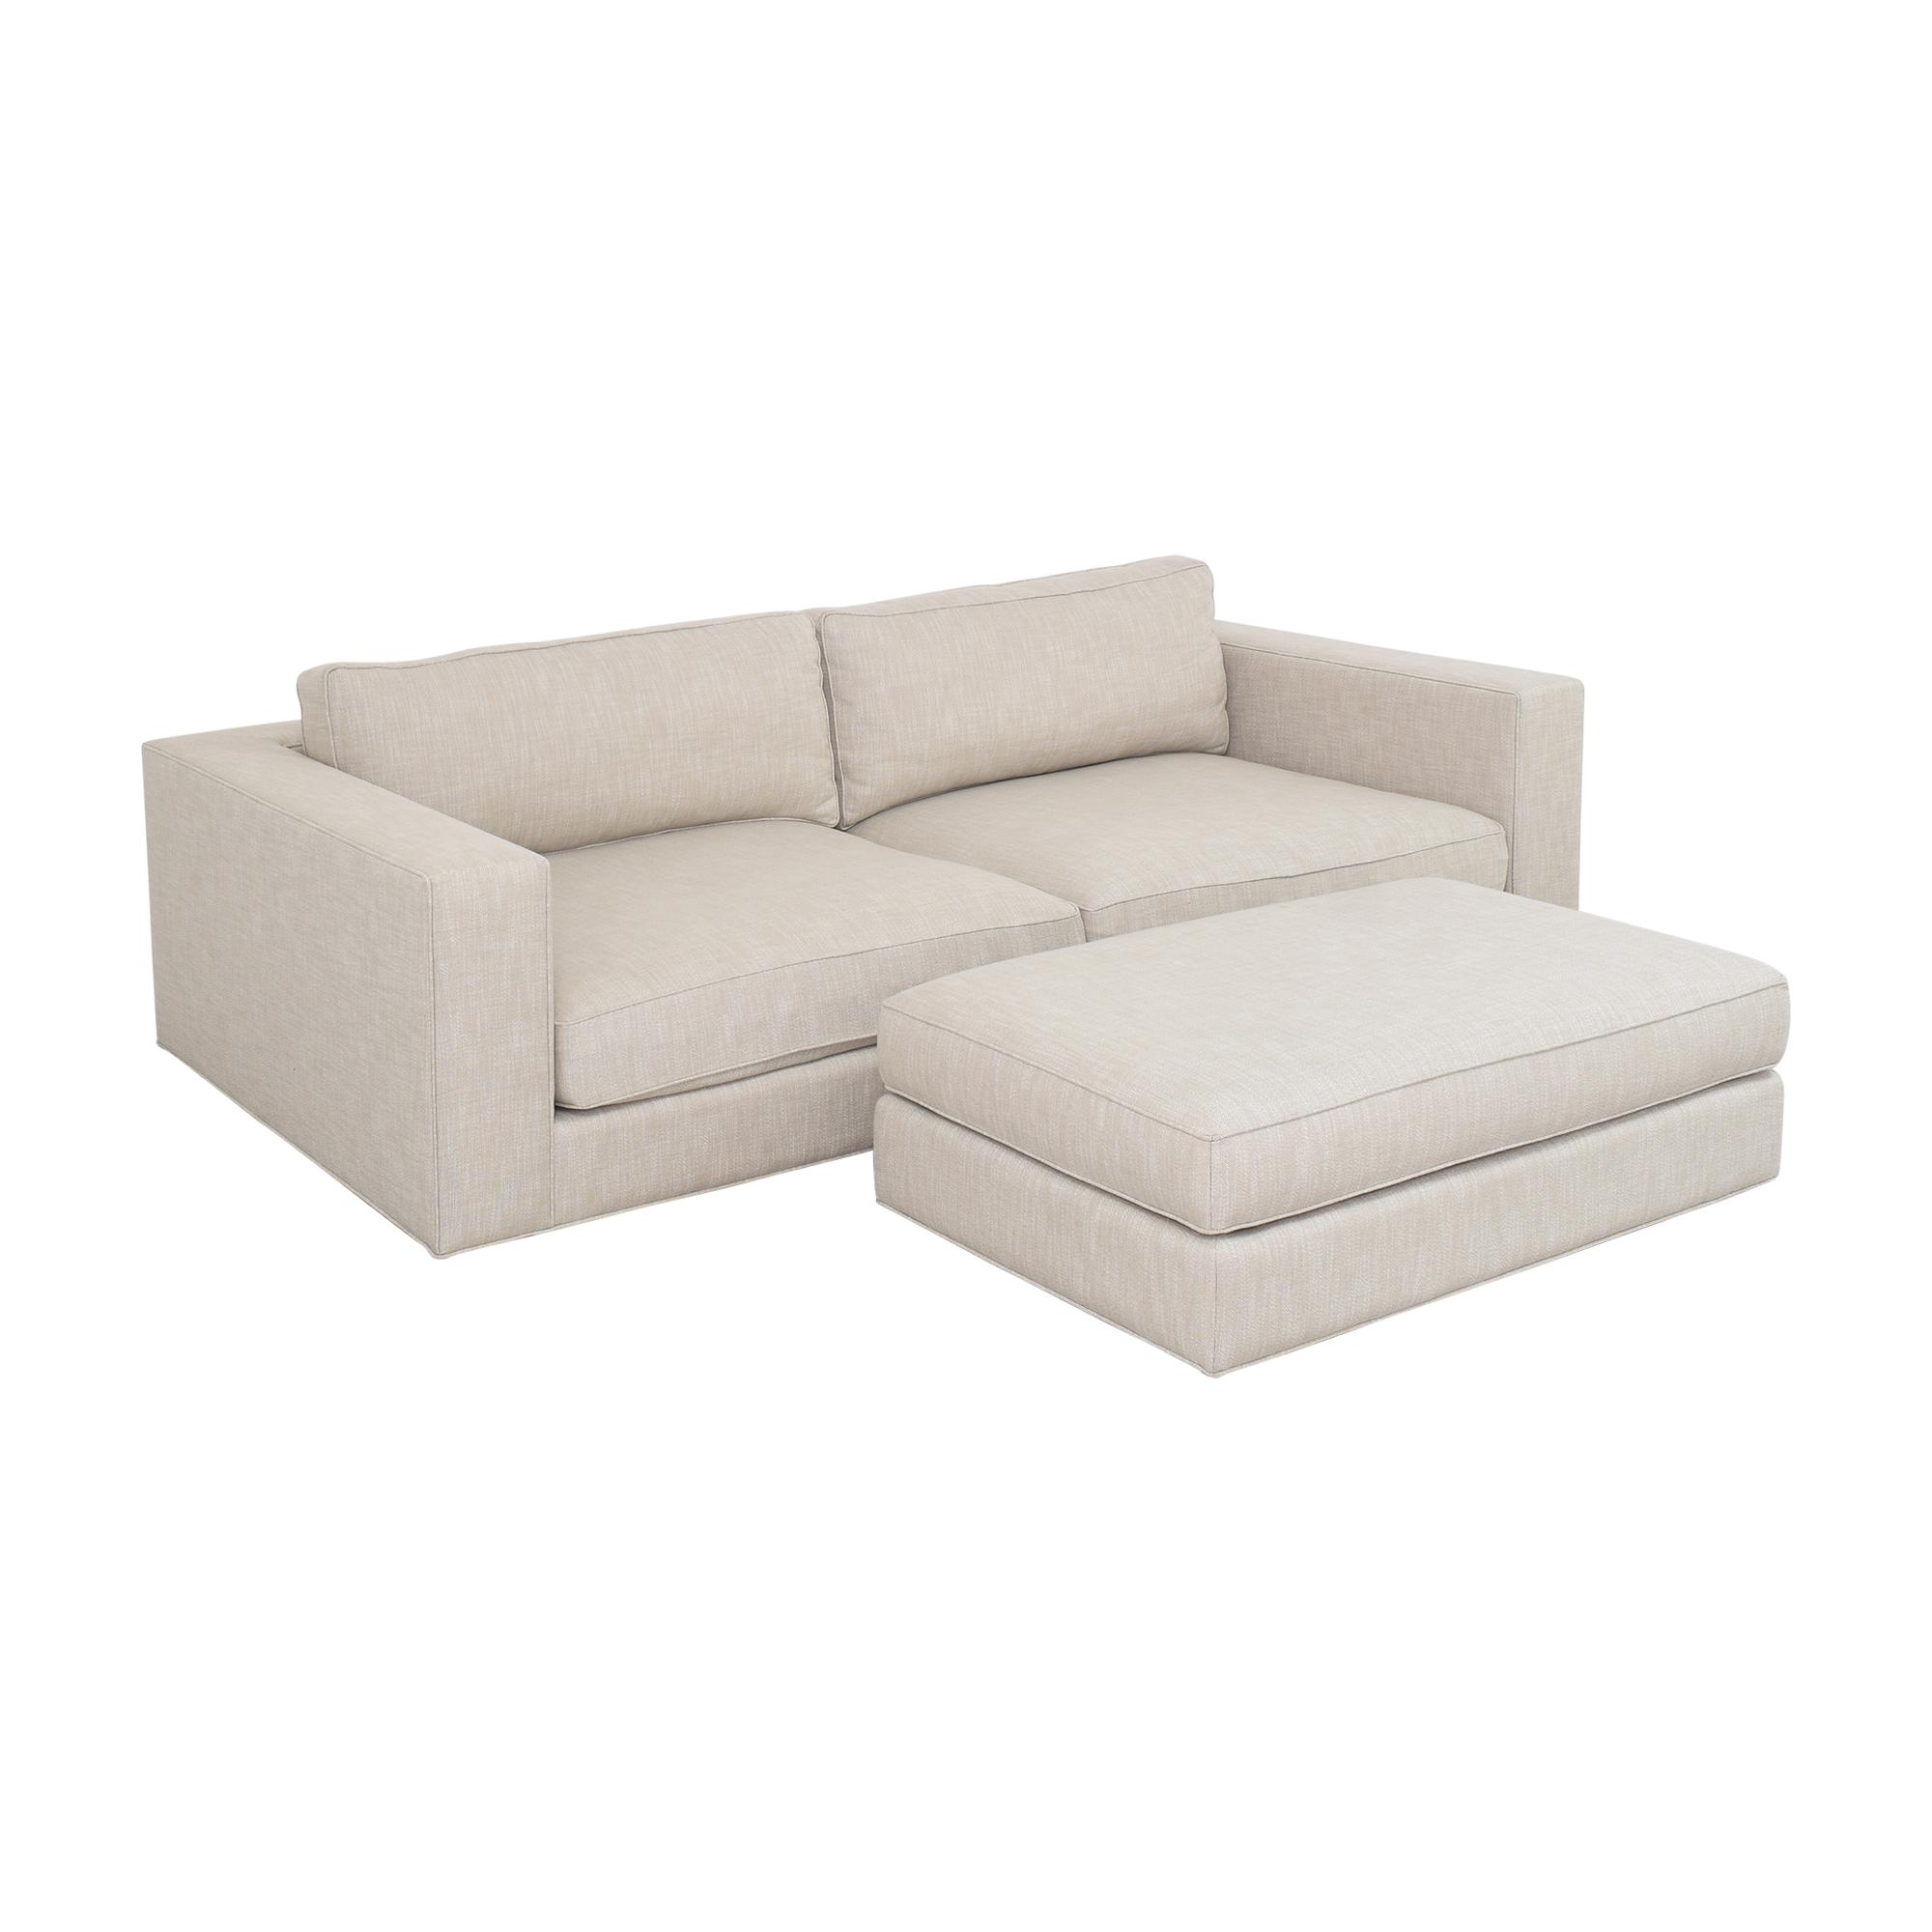 buy Restoration Hardware Maddox Sofa with Ottoman Restoration Hardware Classic Sofas